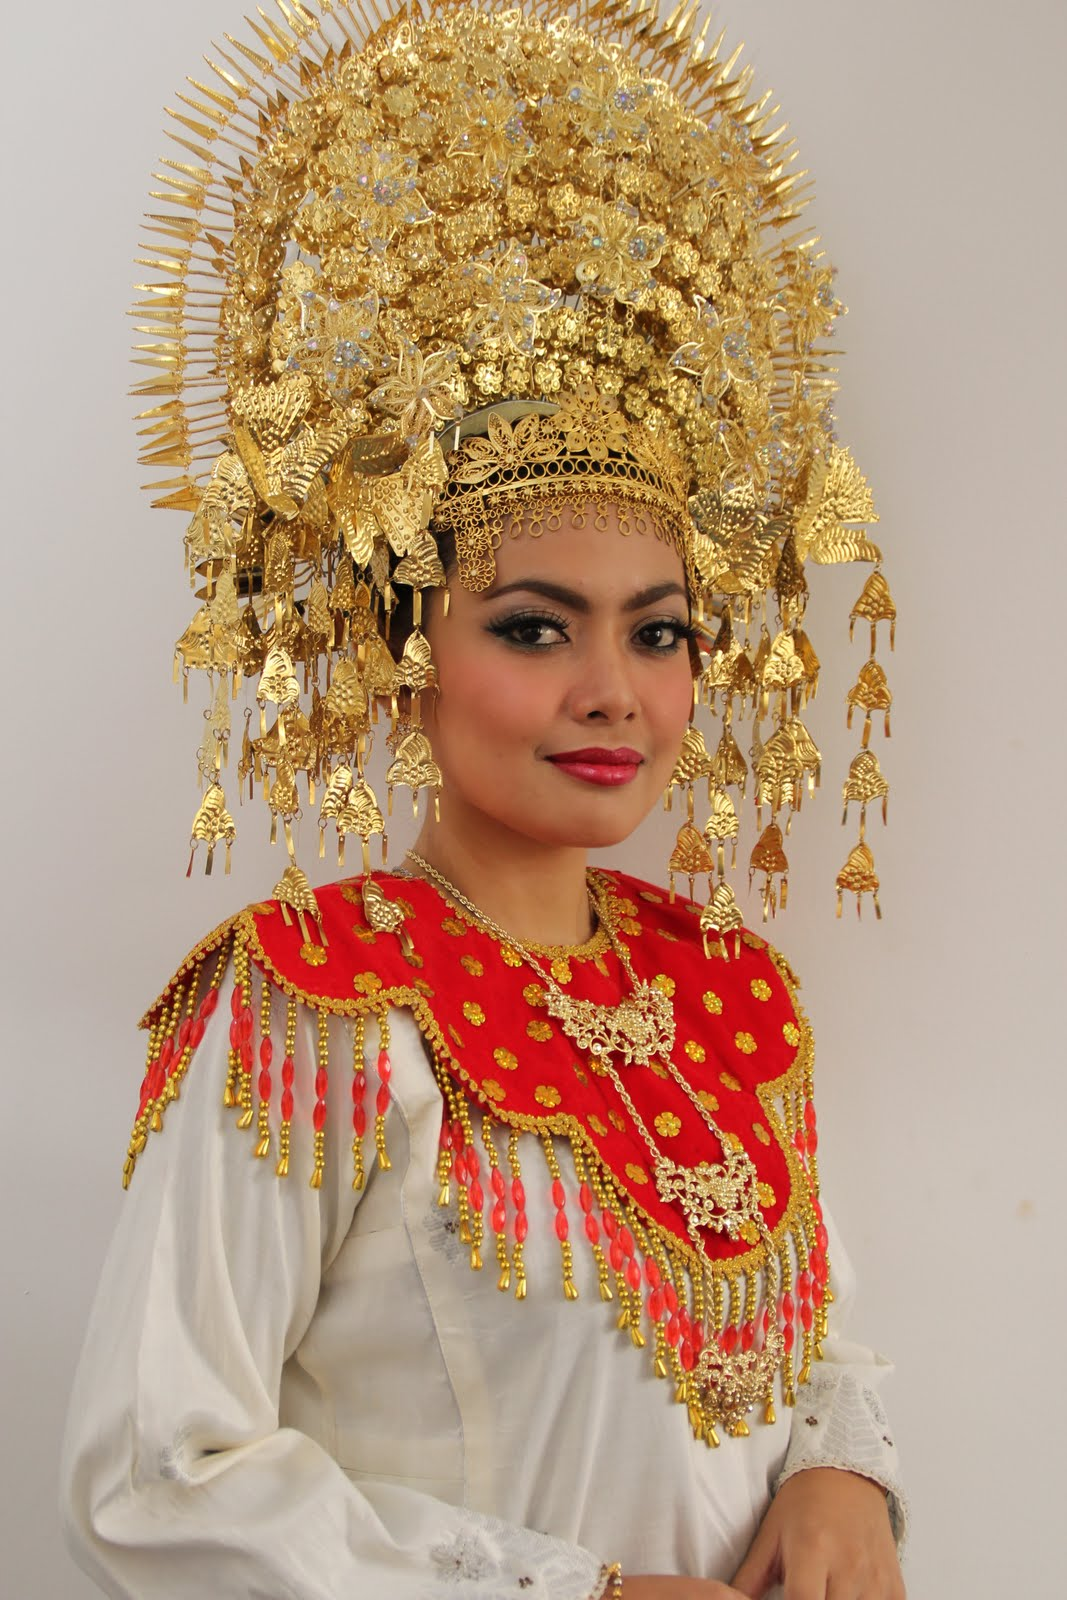 malaysia headpiece sanggul